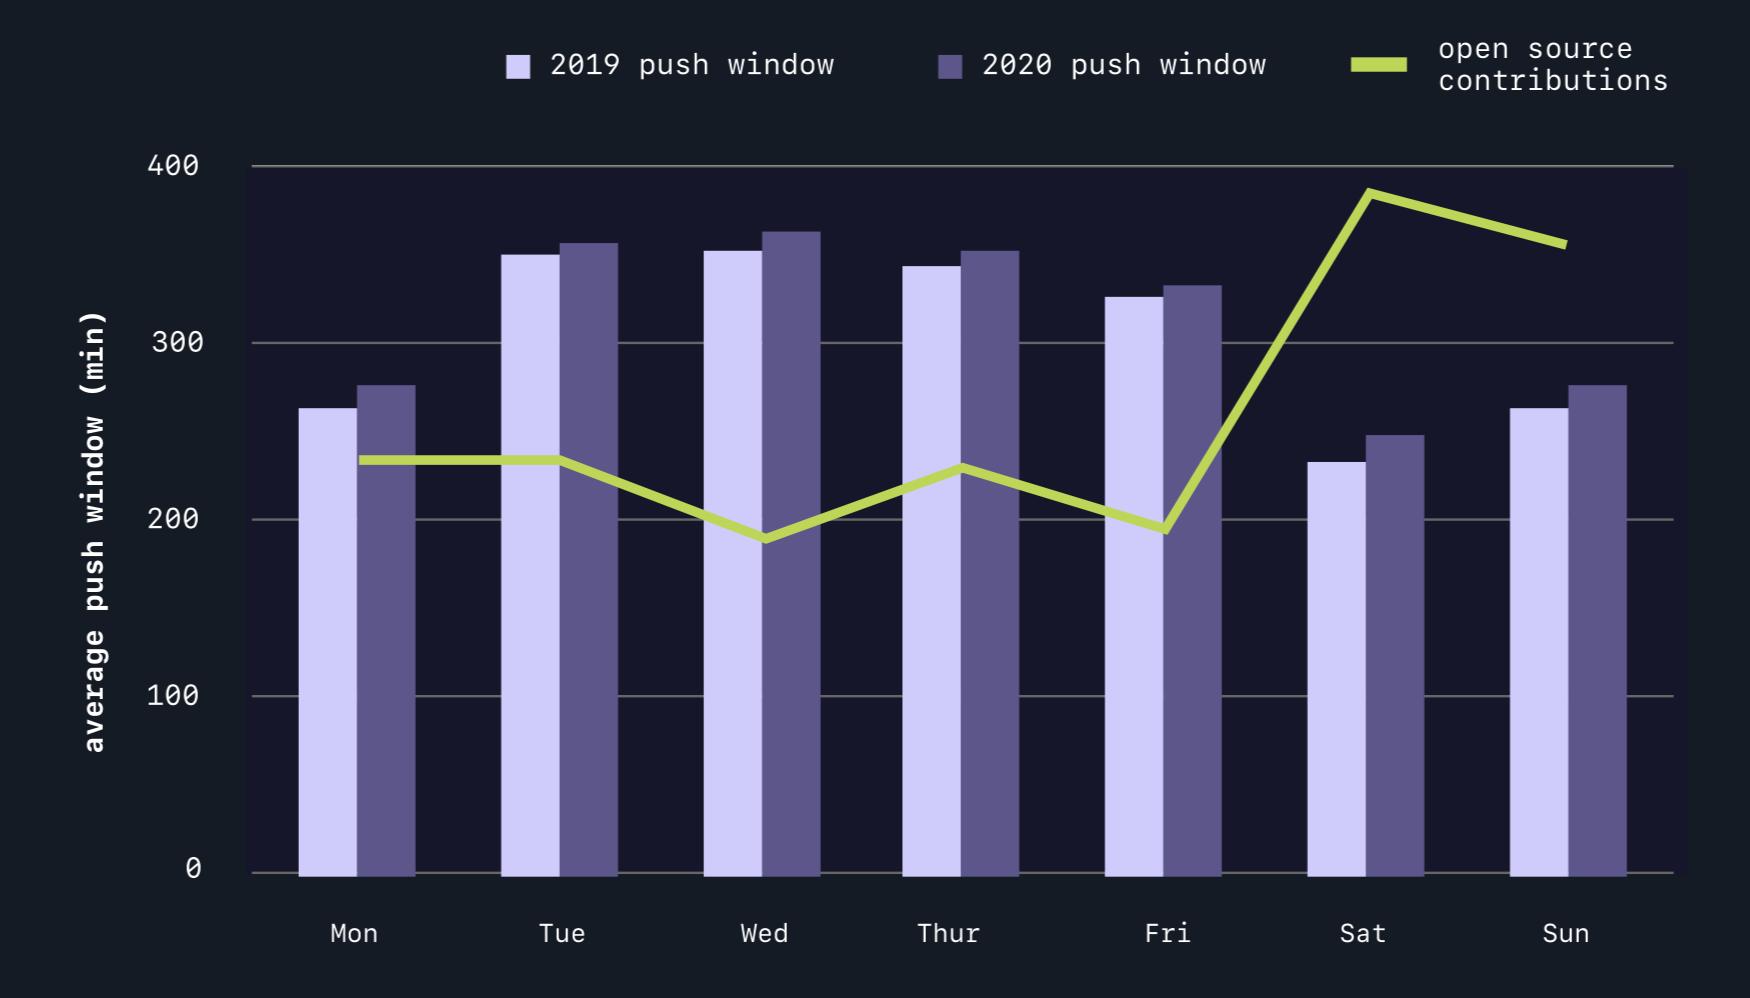 githubs-2020-octoverse报告状态的重点是开发人员正在工作数小时,但正在转向开放项目-创意出口-1 GitHub的2020年现状Octoverse报告摘要:开发人员工作时间更多,但转向创意项目的开源项目